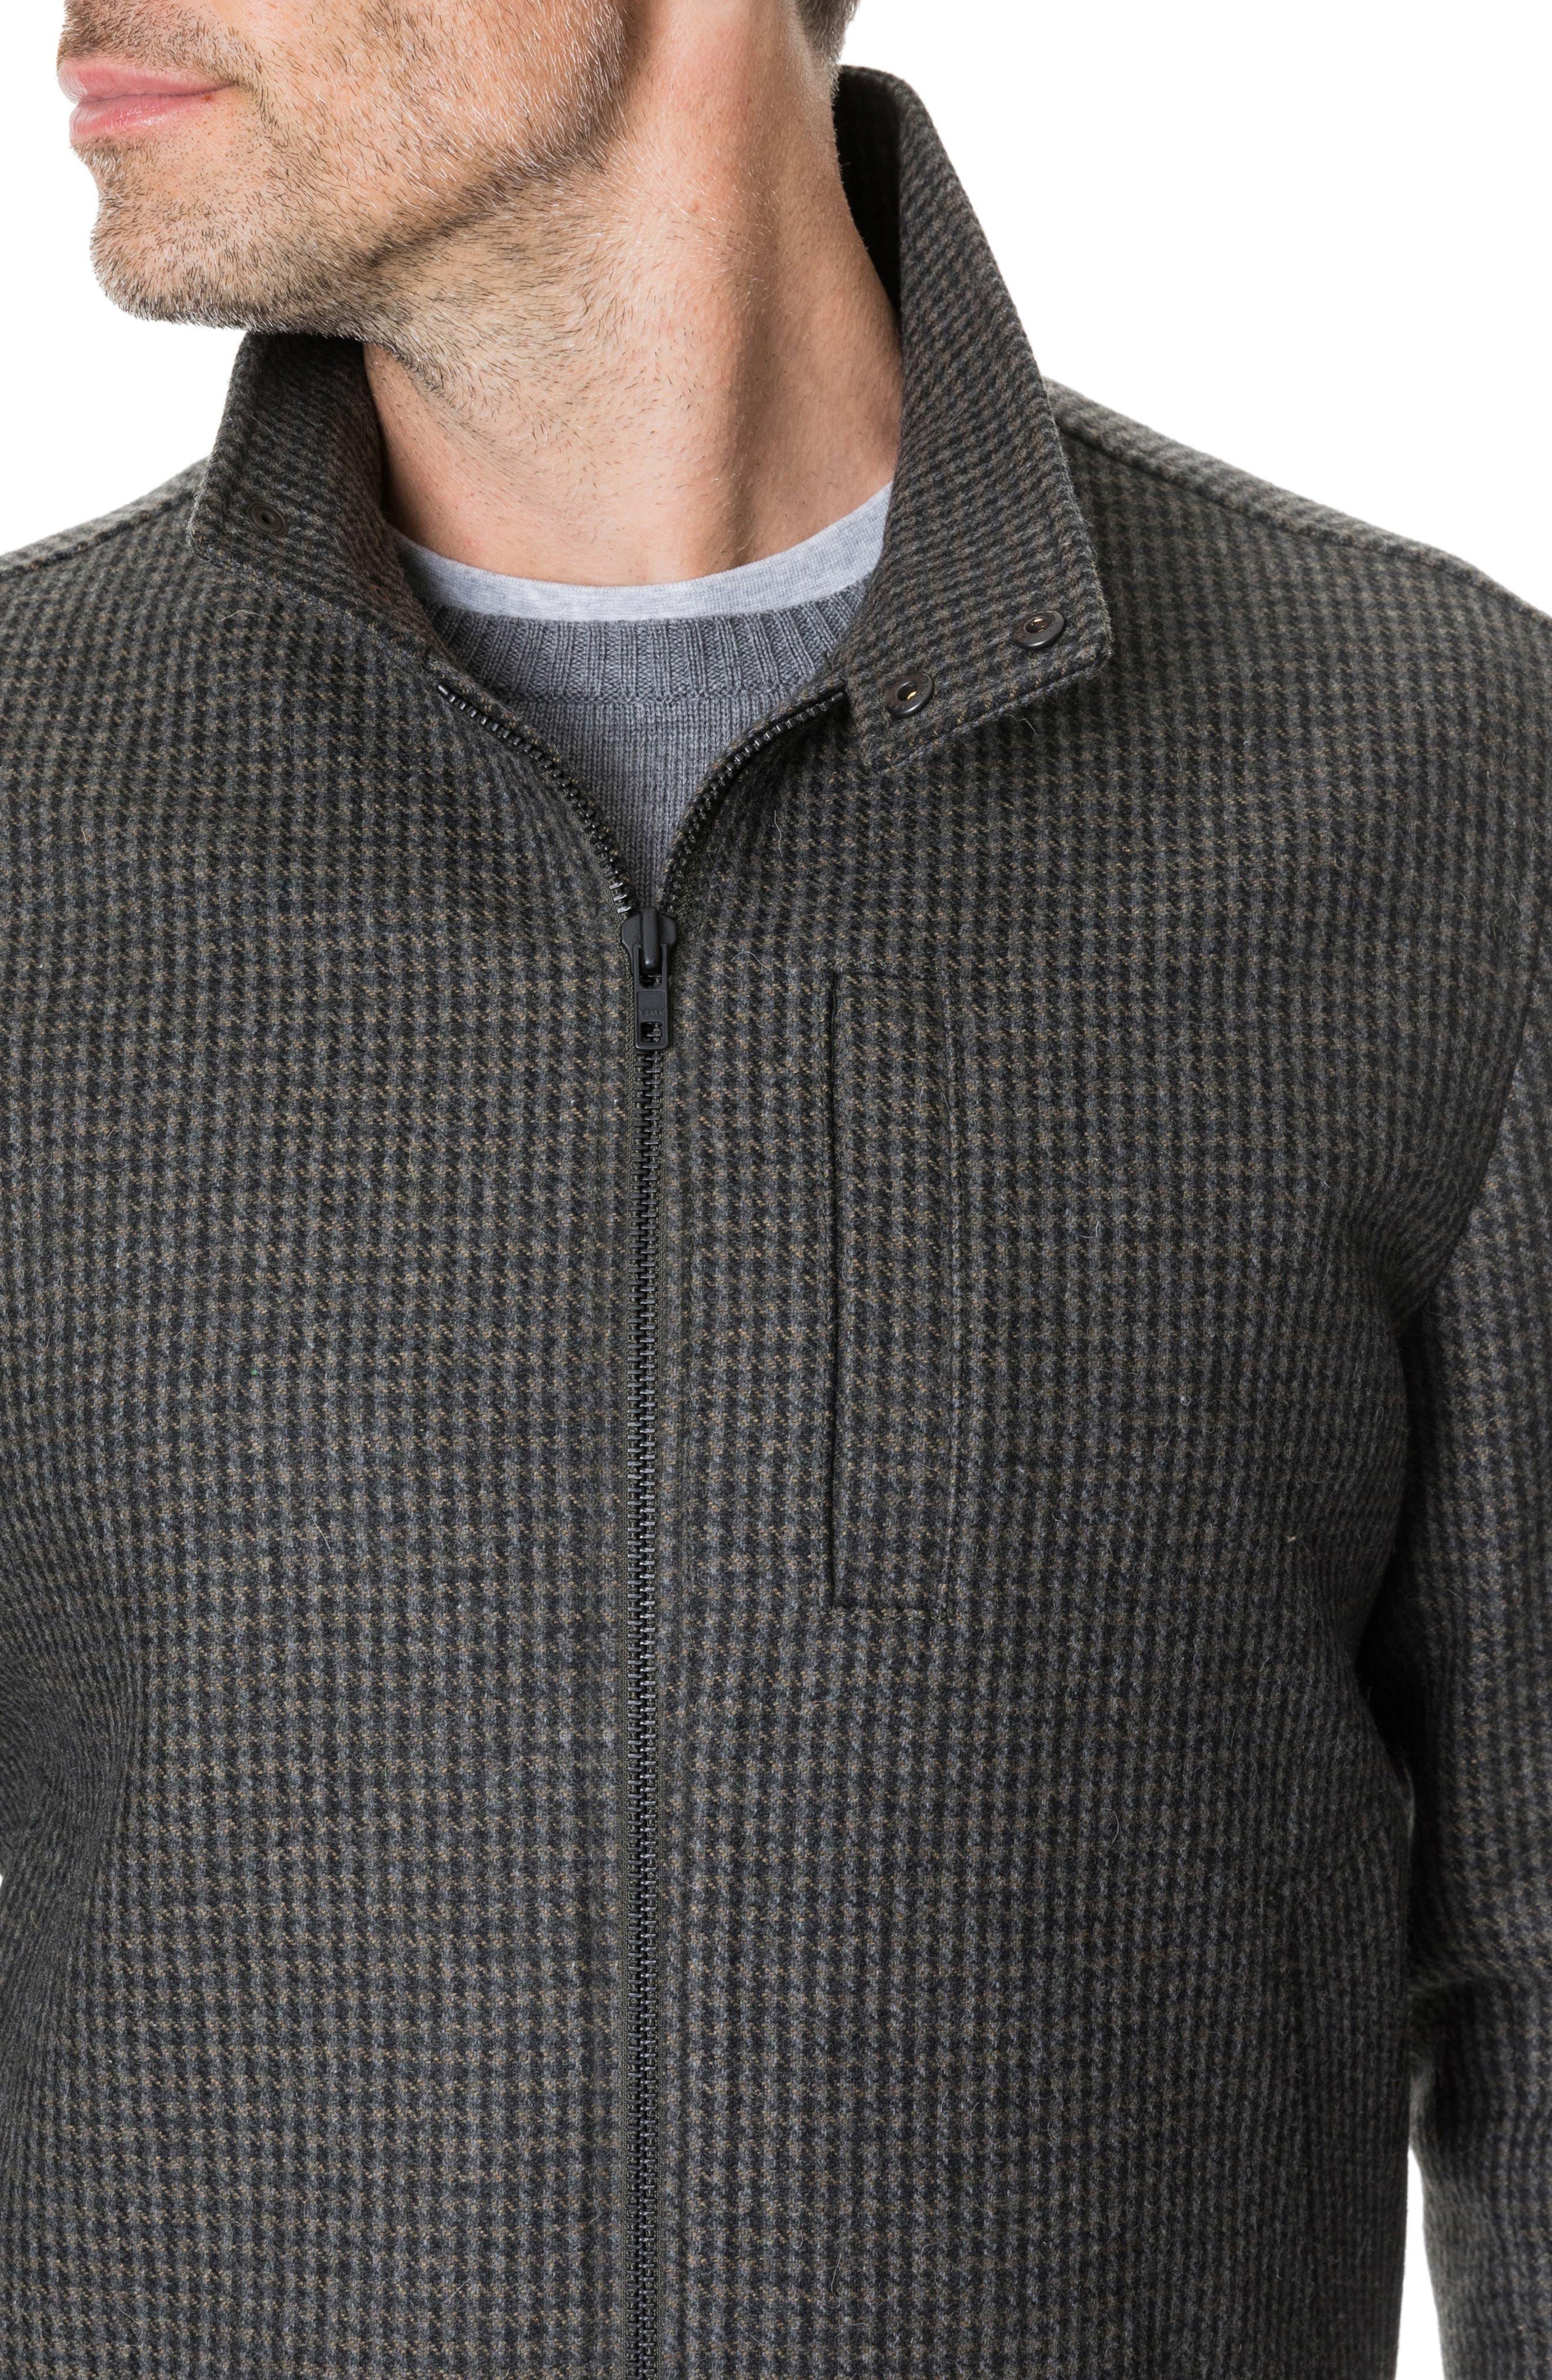 Oyster Cove Regular Fit Wool Blend Jacket,                             Alternate thumbnail 4, color,                             OLIVE